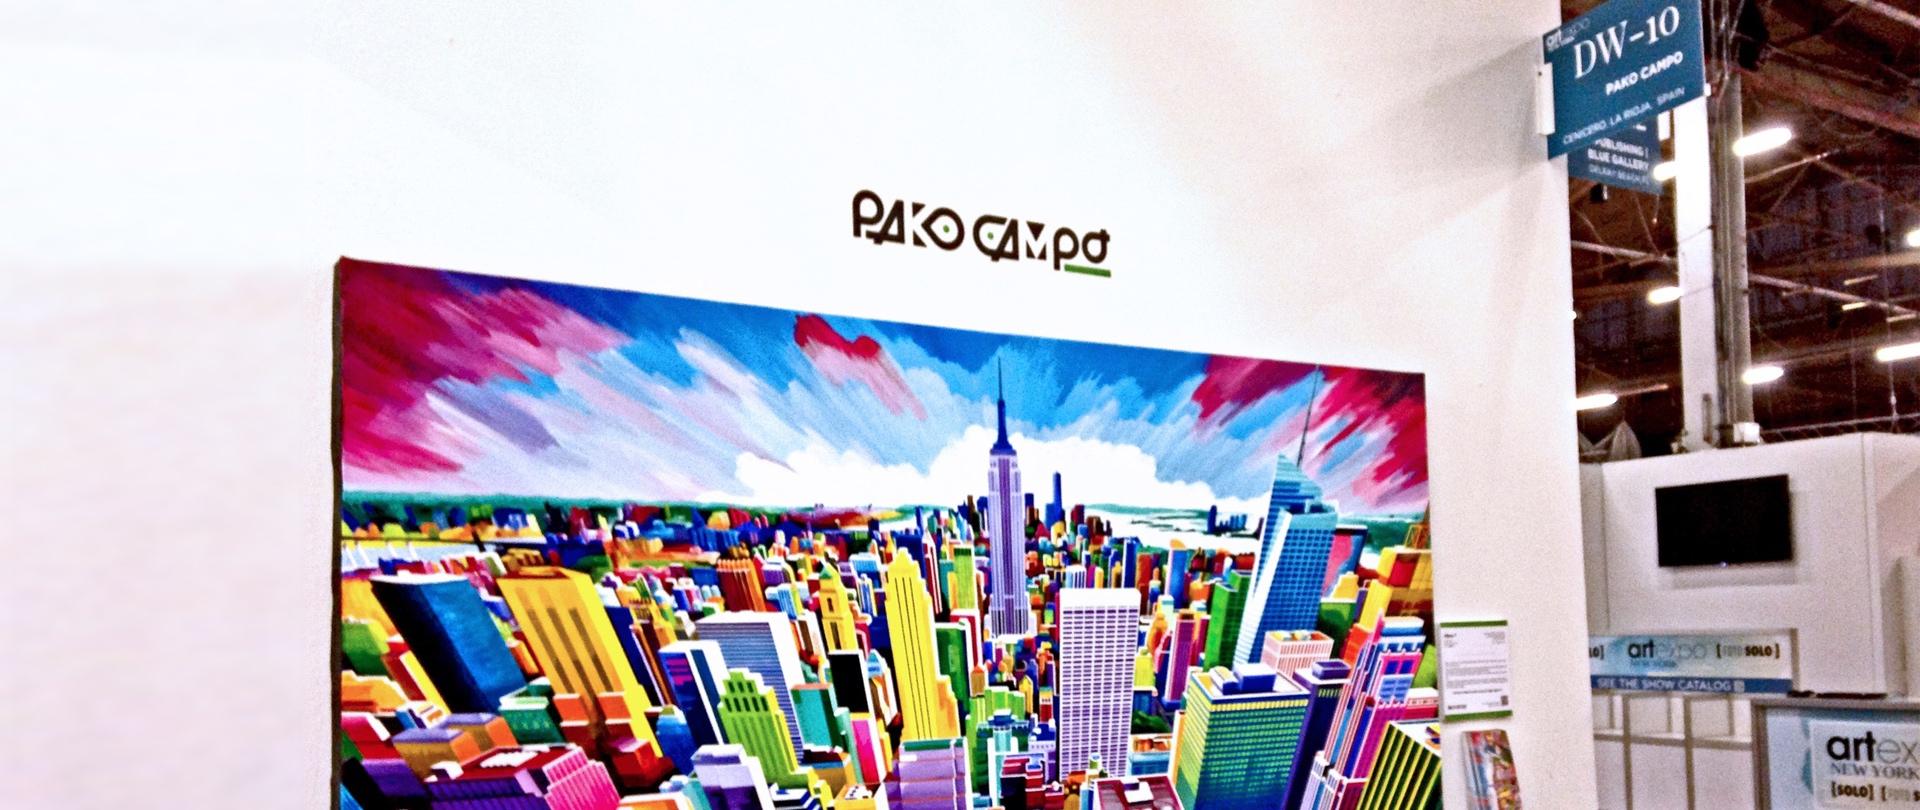 Artexpo New York 2018 - DW-10 - Pako Campo